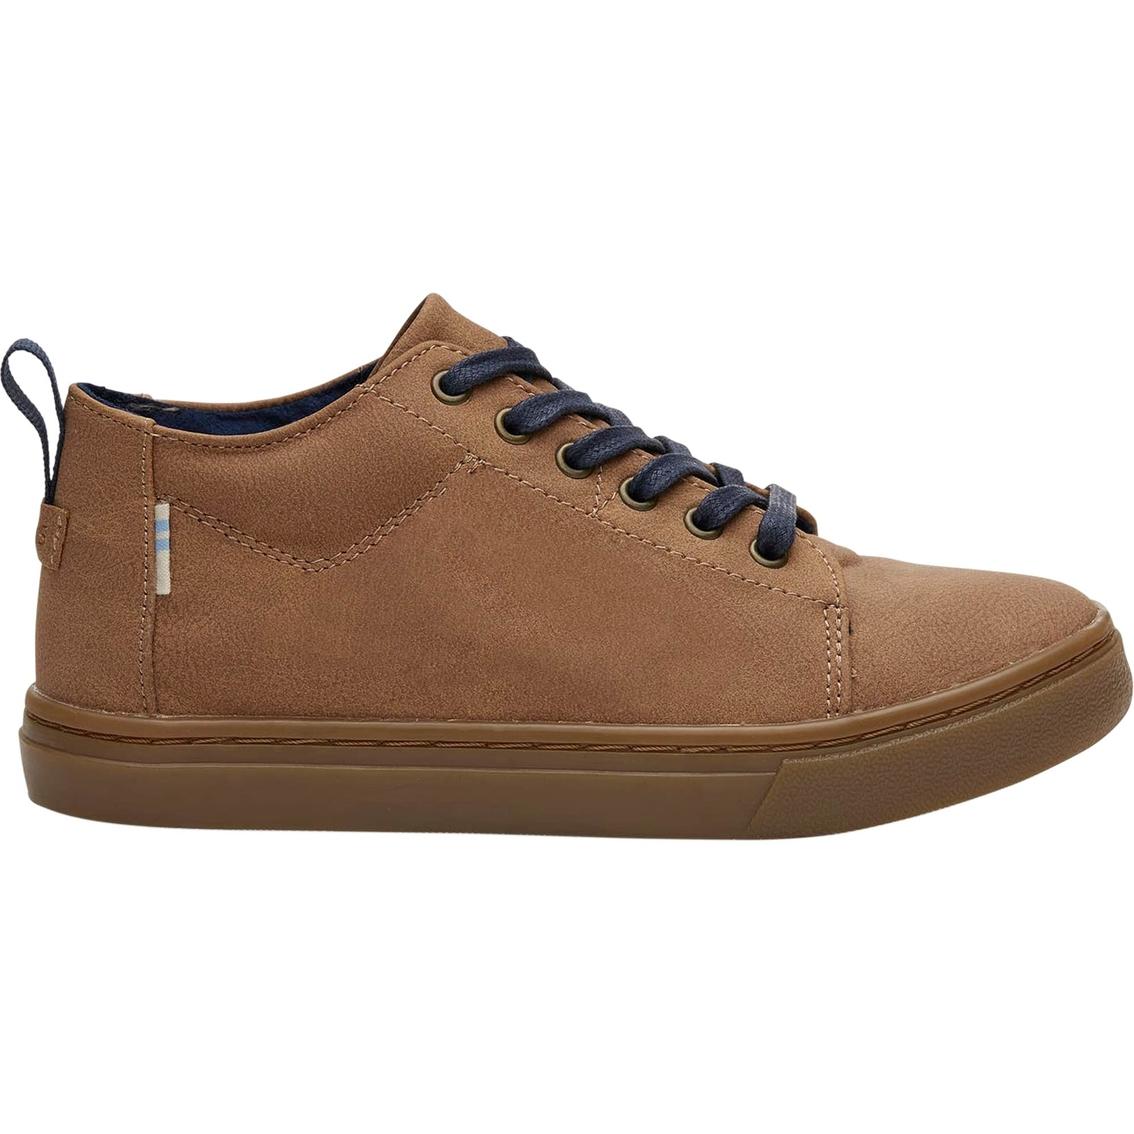 1133b5ede1b Toms Boys Lenny Mid Sneakers